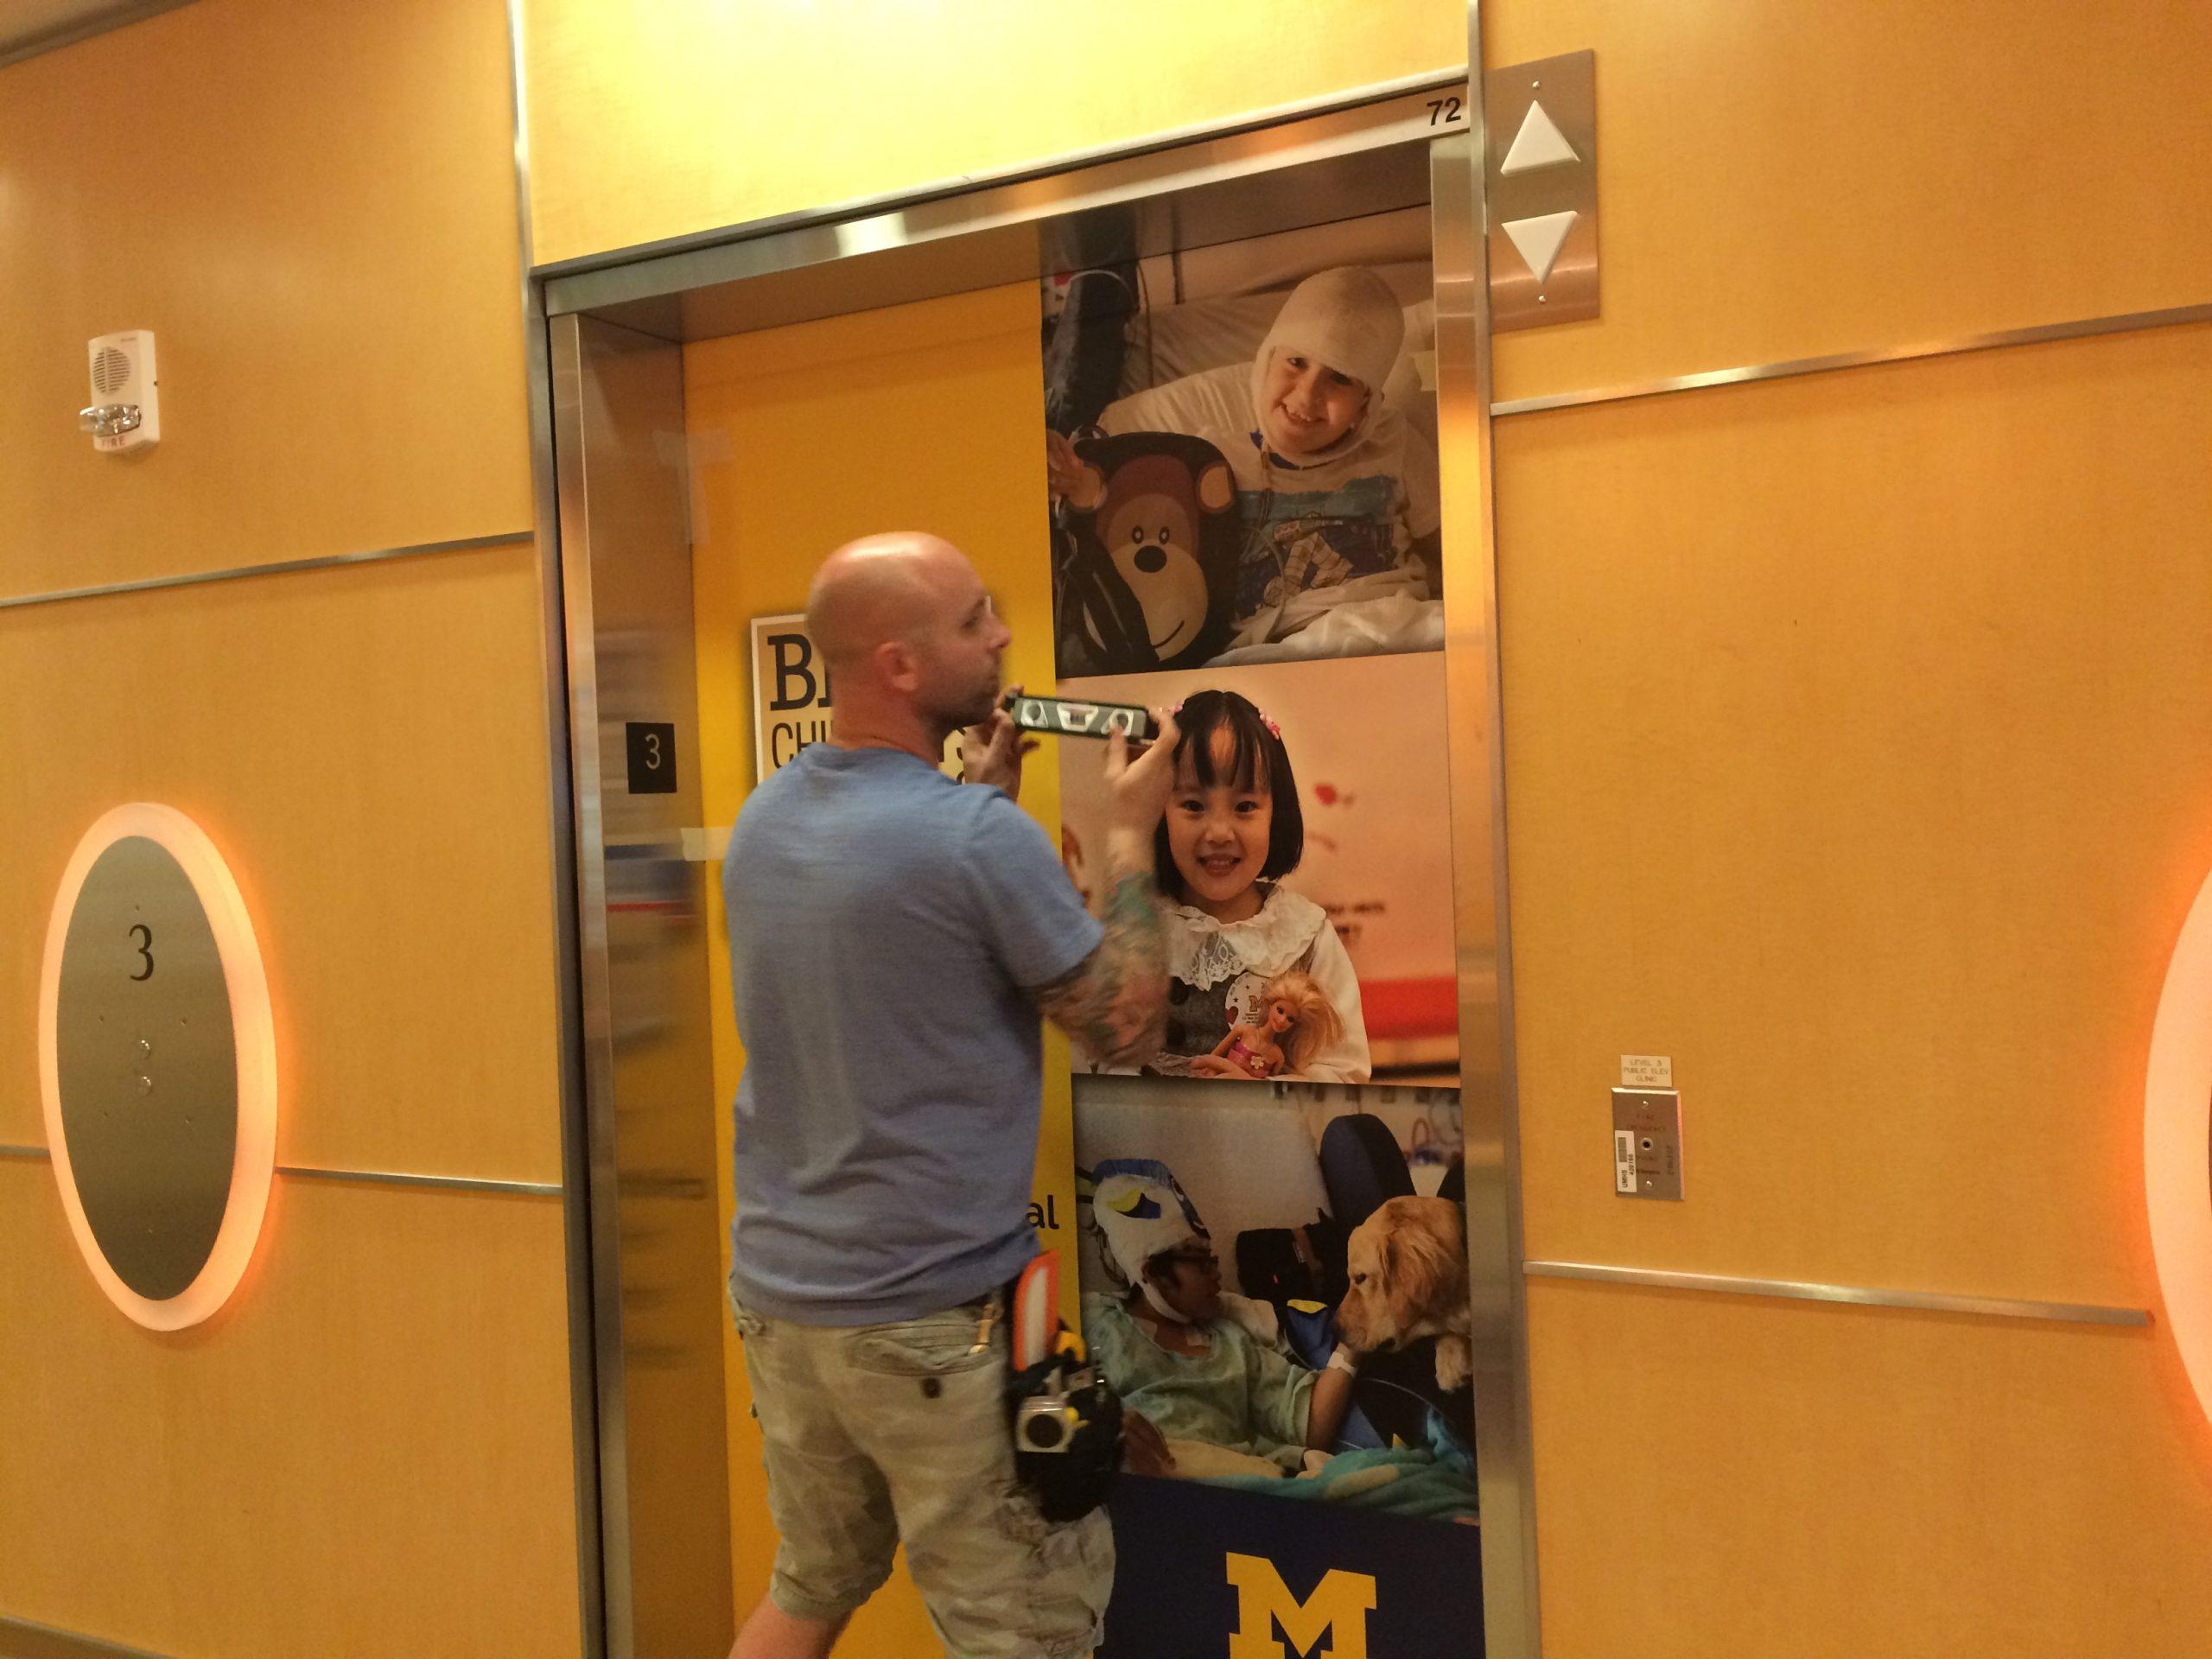 CS Mott Childrens Hospital Elevators - 03